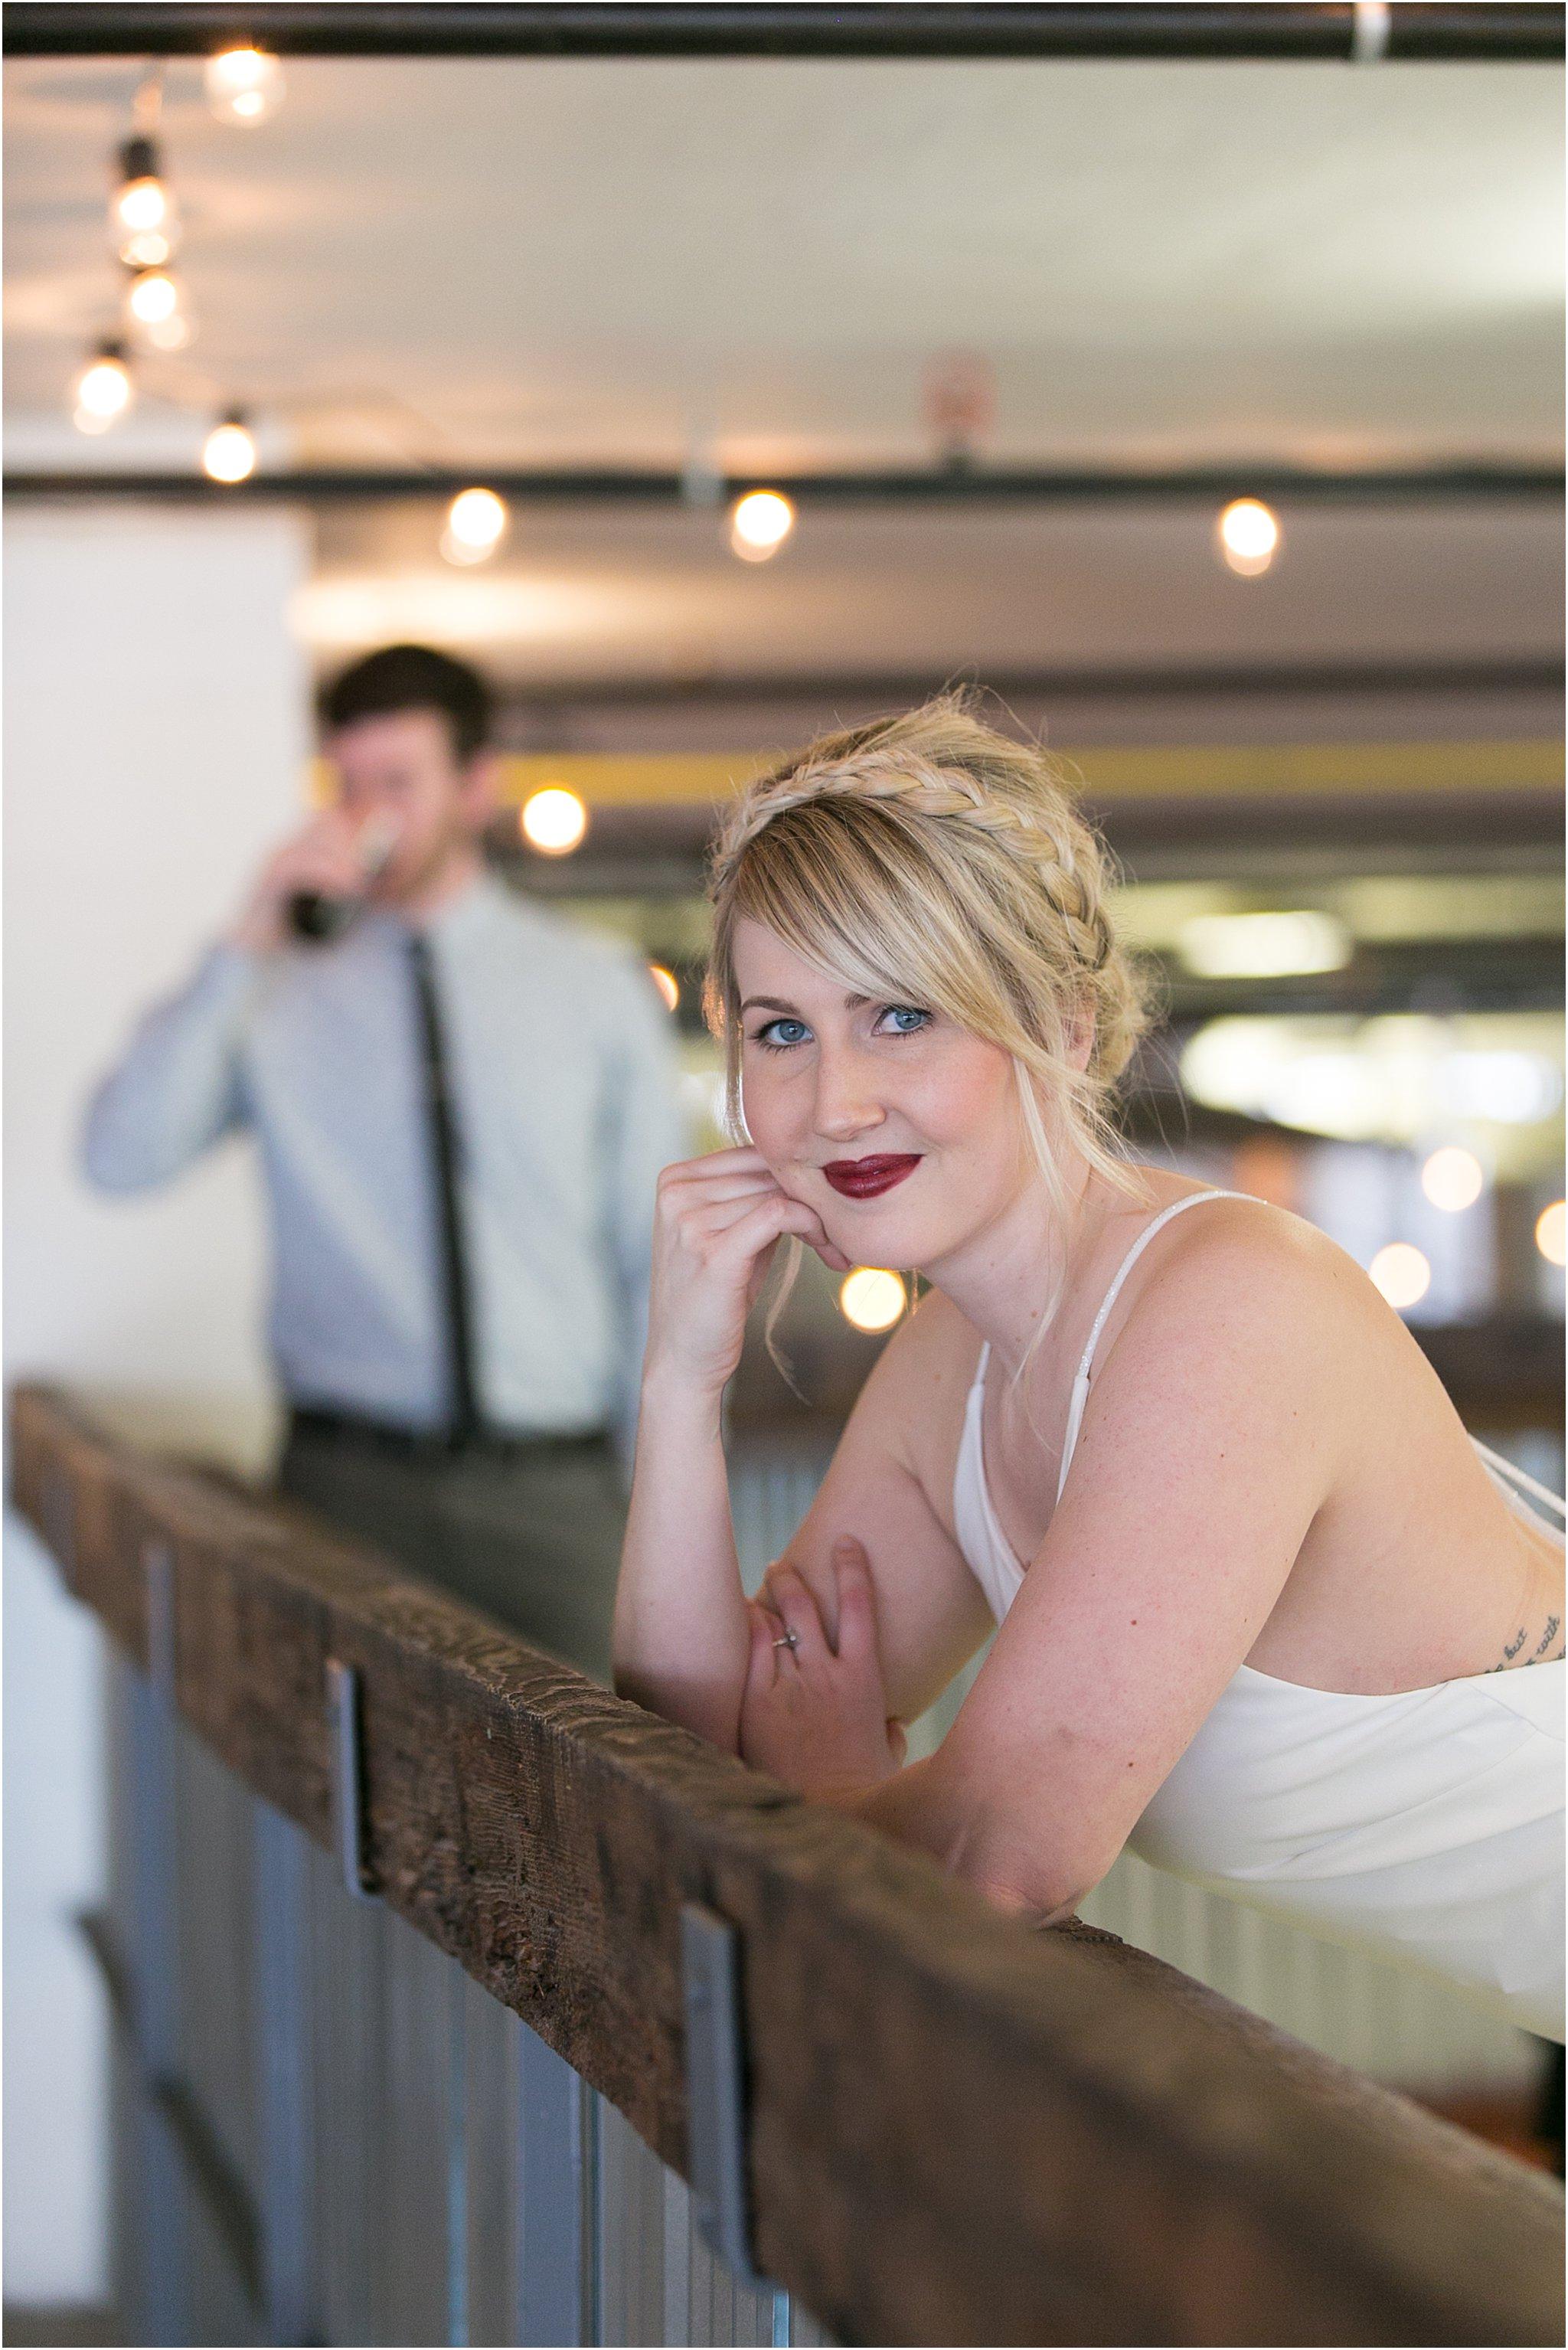 jessica_ryan_photography_oconnor_brewing_wedding_oconnor_brewing_co_norfolk_virginia_roost_flowers_blue_birds_garage__0811